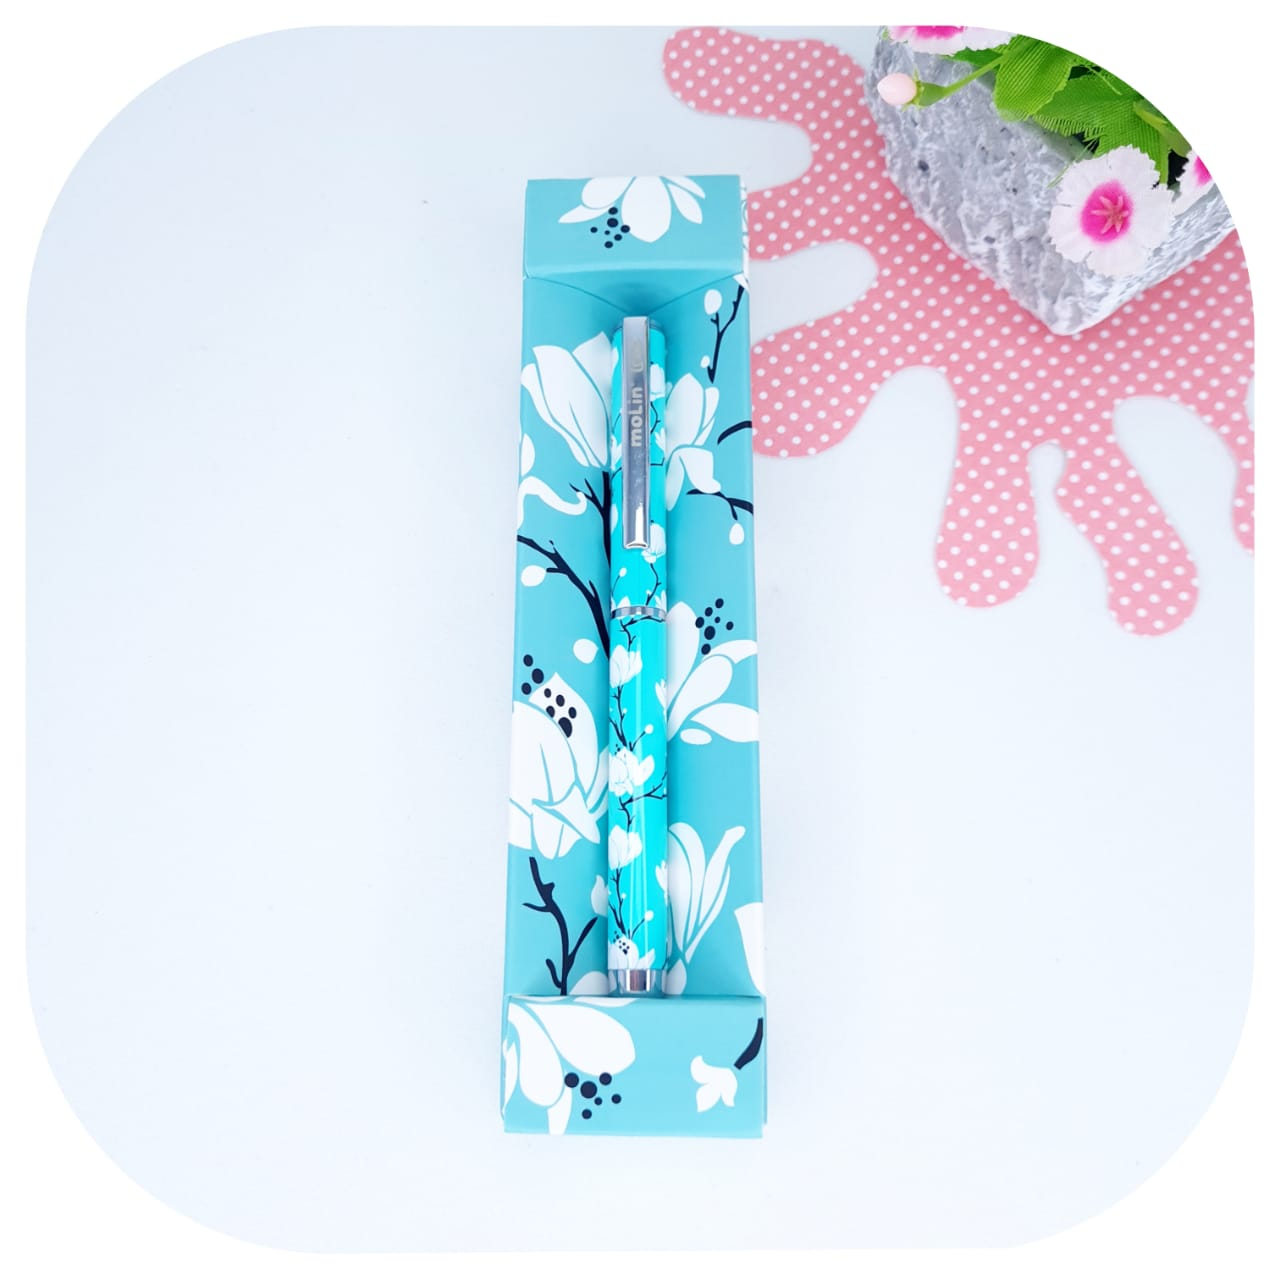 Caneta de Luxo Green Flowers - Molin